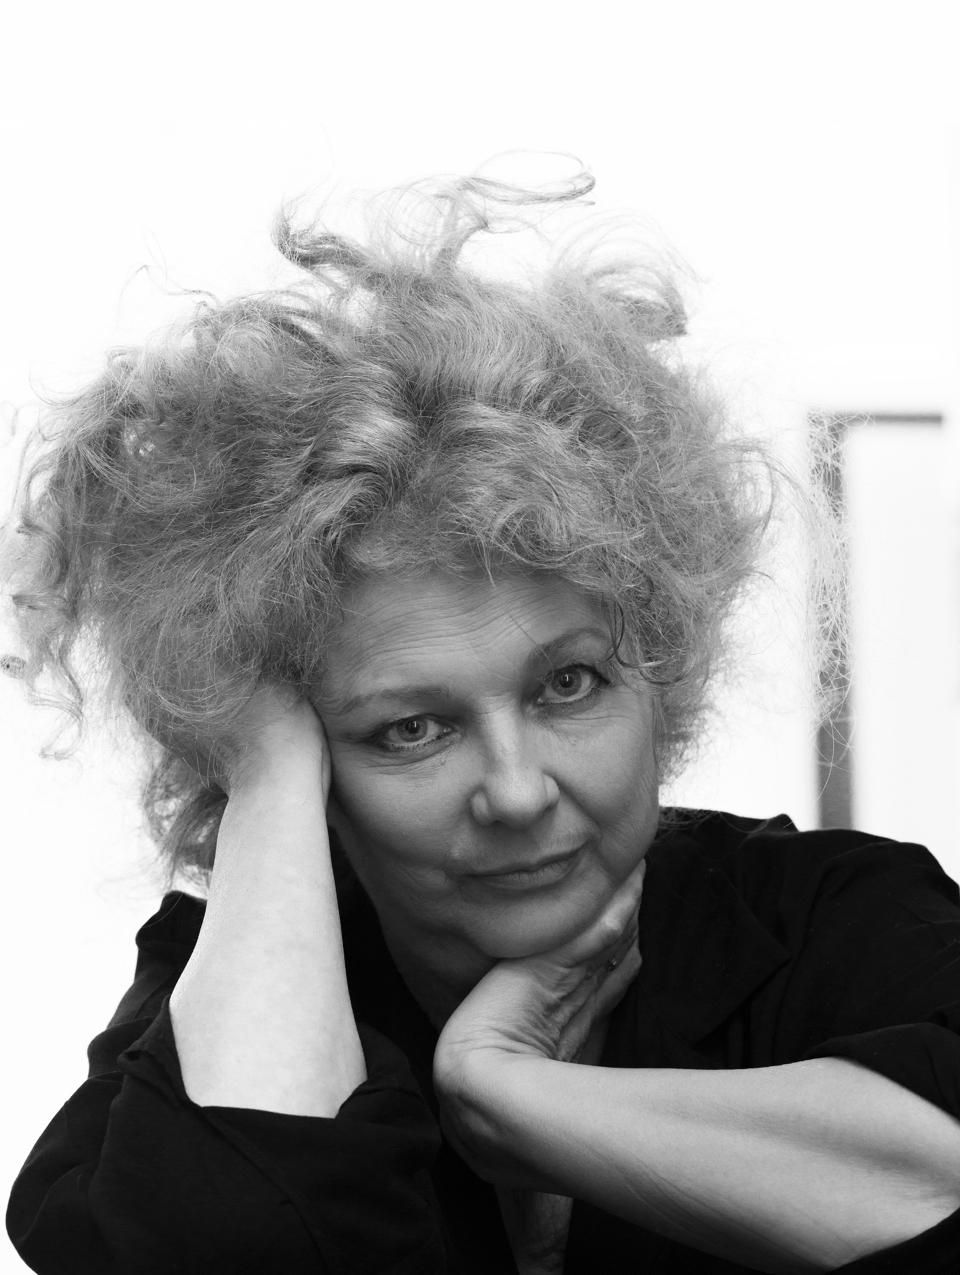 Aquarel gezocht Marlene Dumas